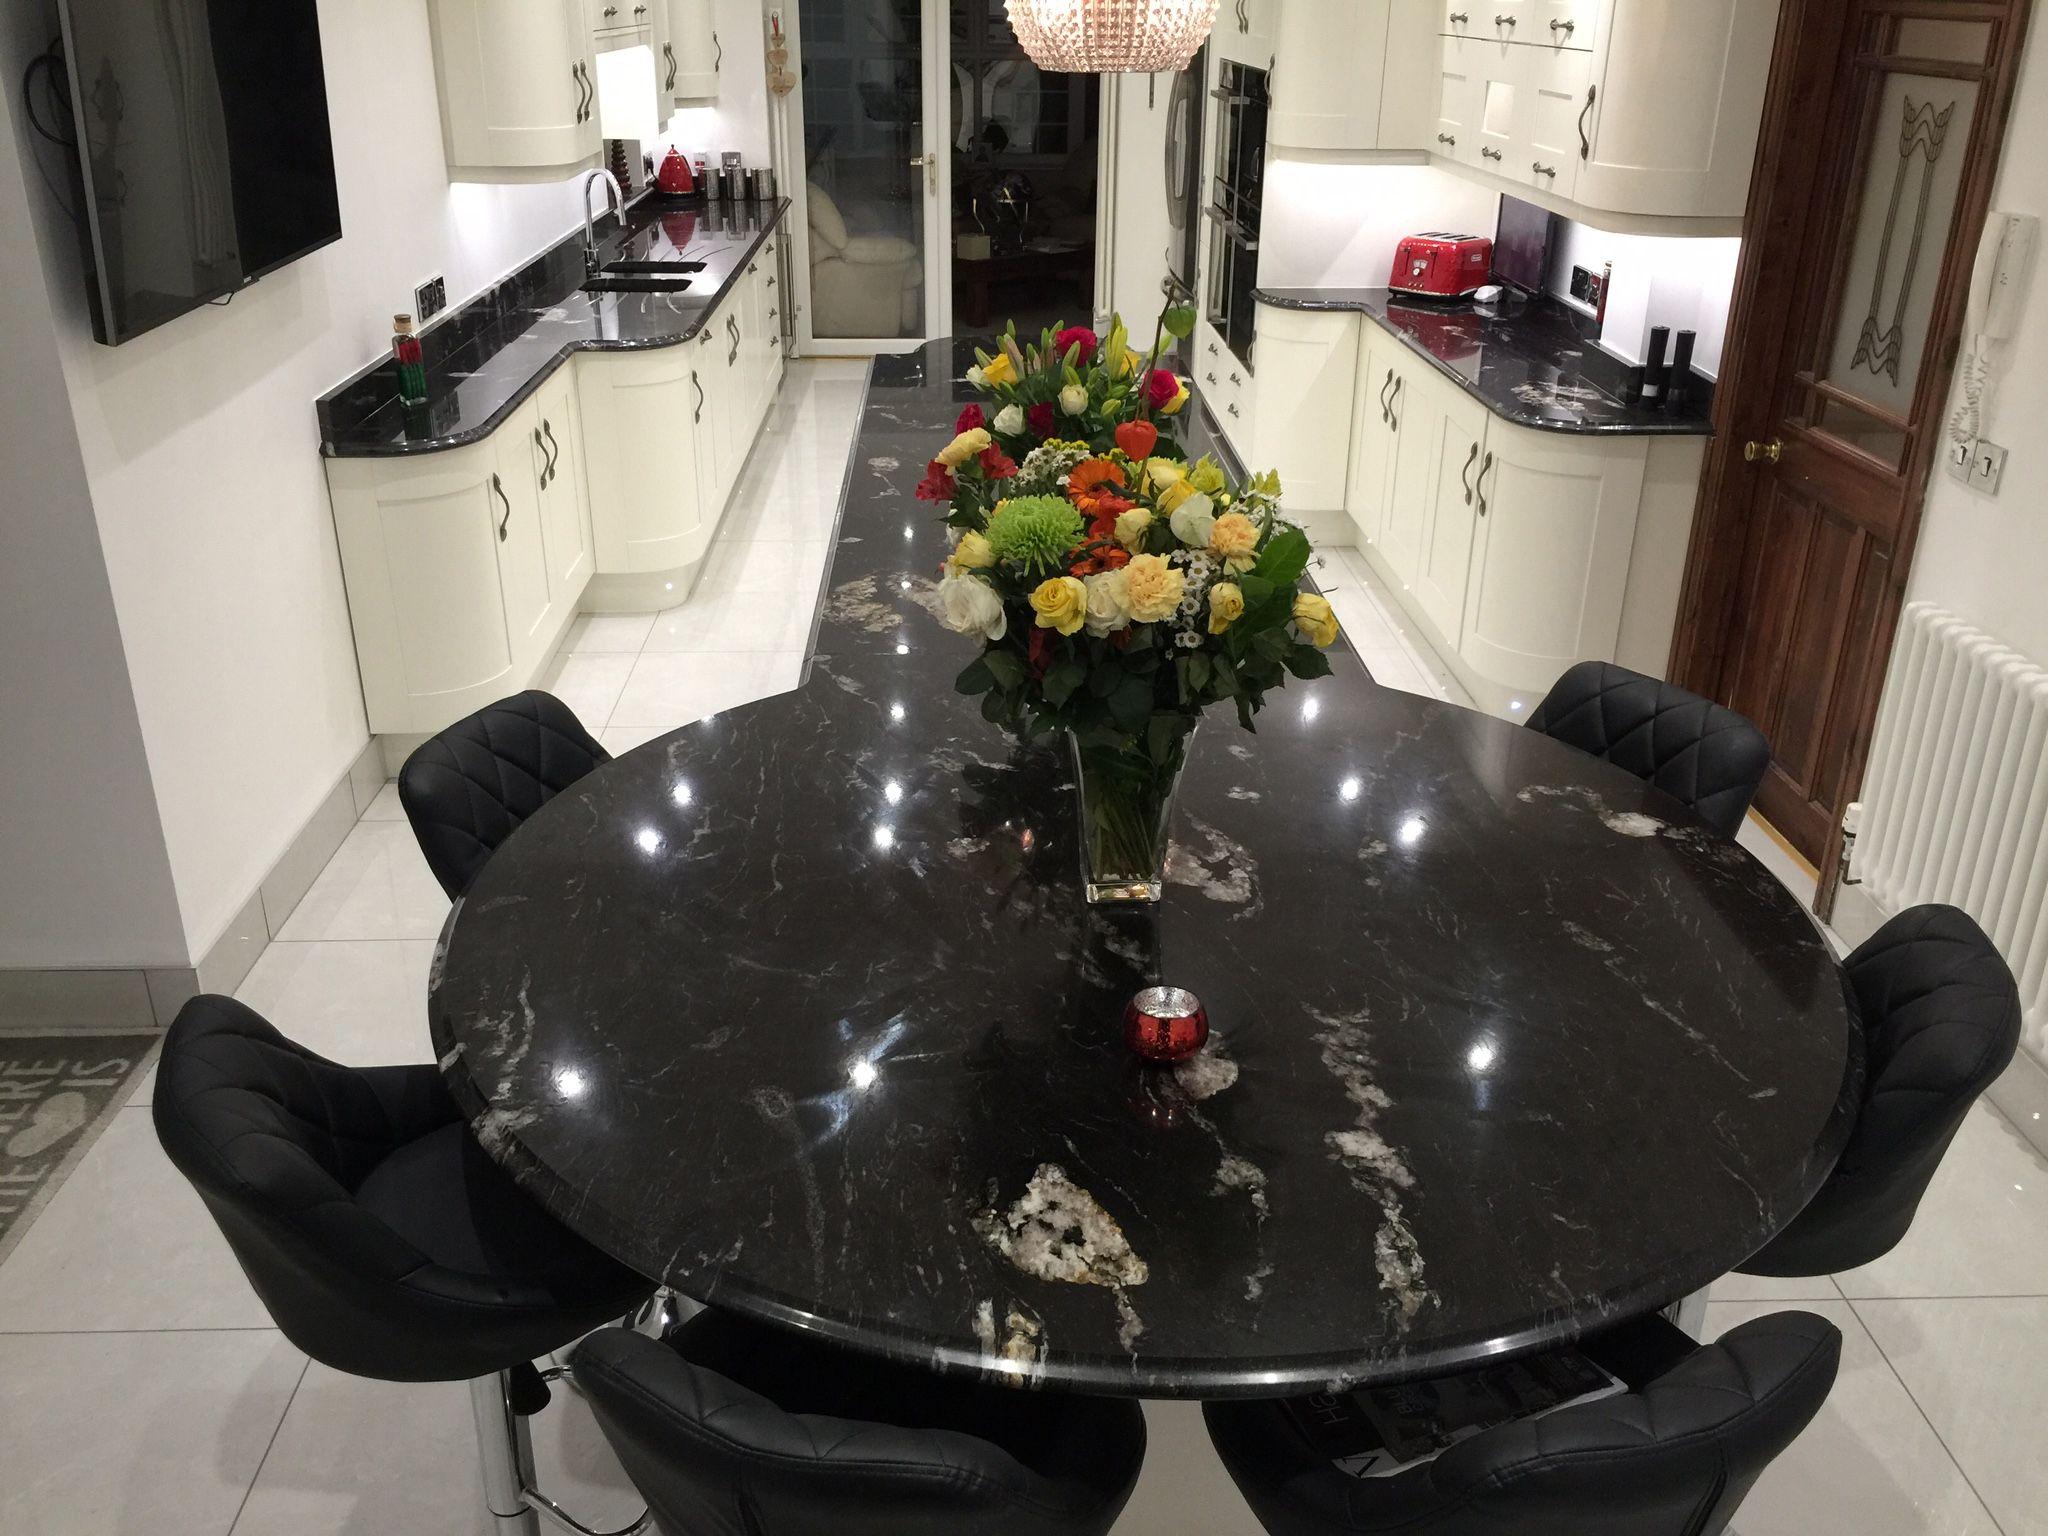 Broad Oak Porcelain Shaker Kitchen with curved doors